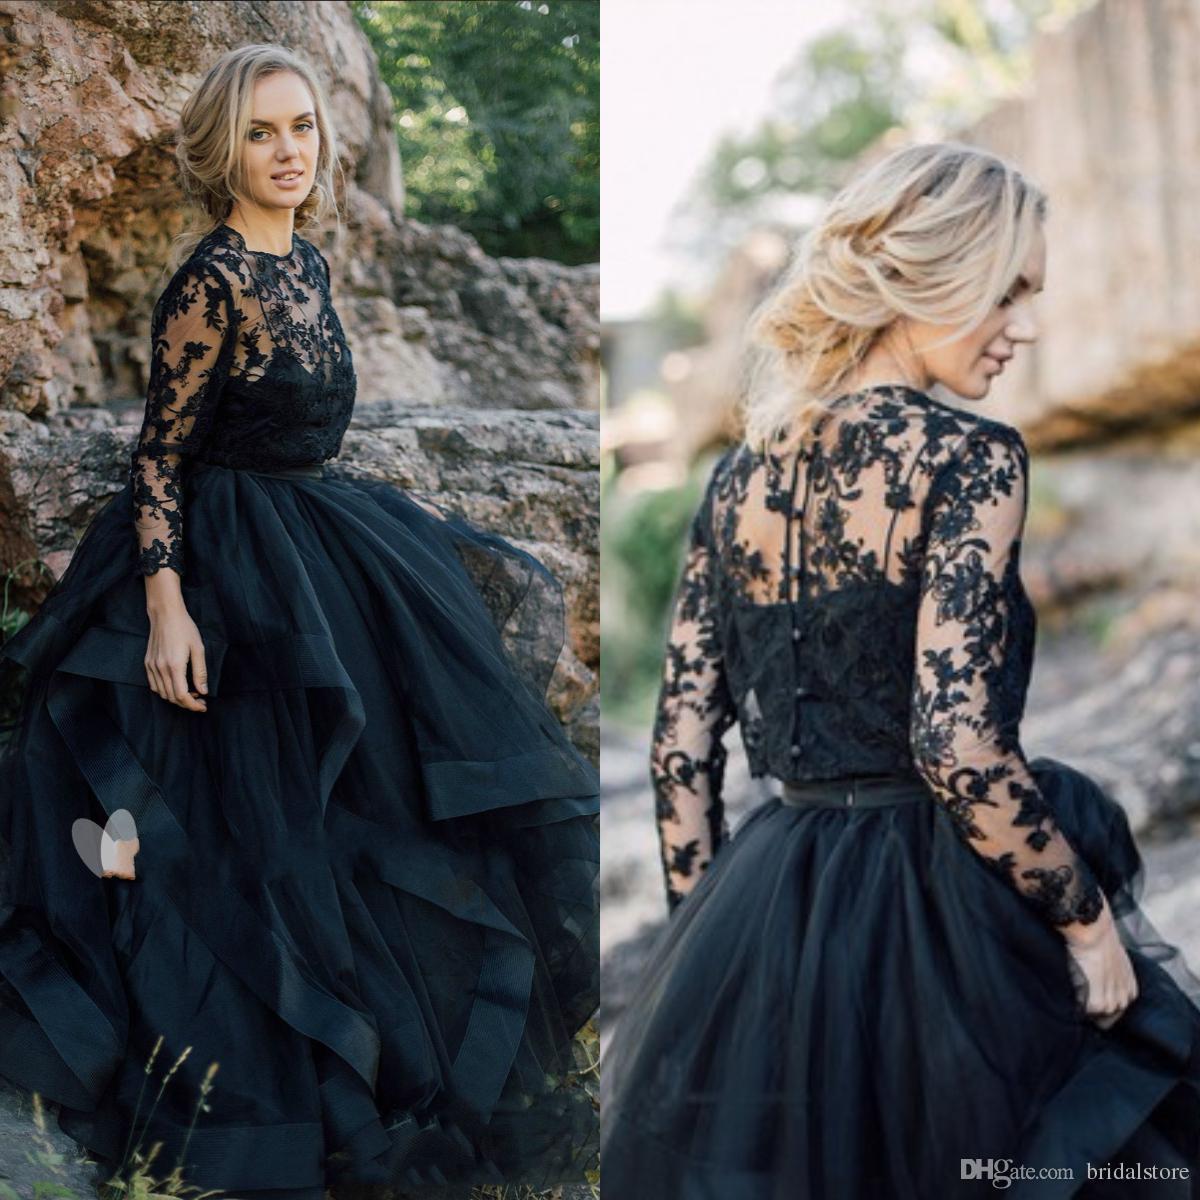 Black Country Gothic Wedding Dresses Sheer Neckline Lace Bridal Gown Cheap Bohemian Tulle Ruffles Long Sleeve robes de mariée Button Bride